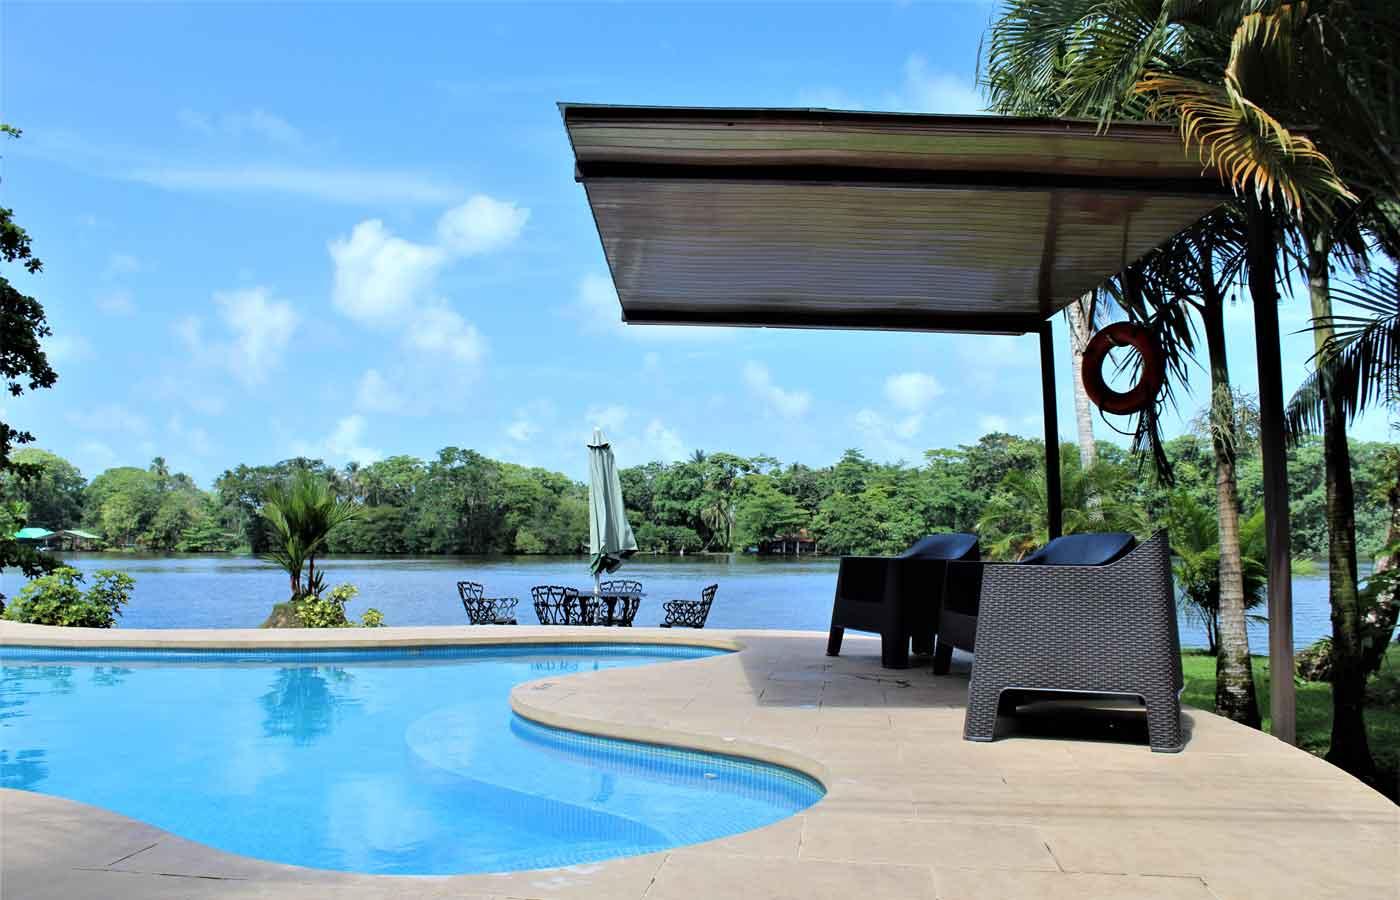 Hotel Manatus, Tortuguero National Park, Costa Rica